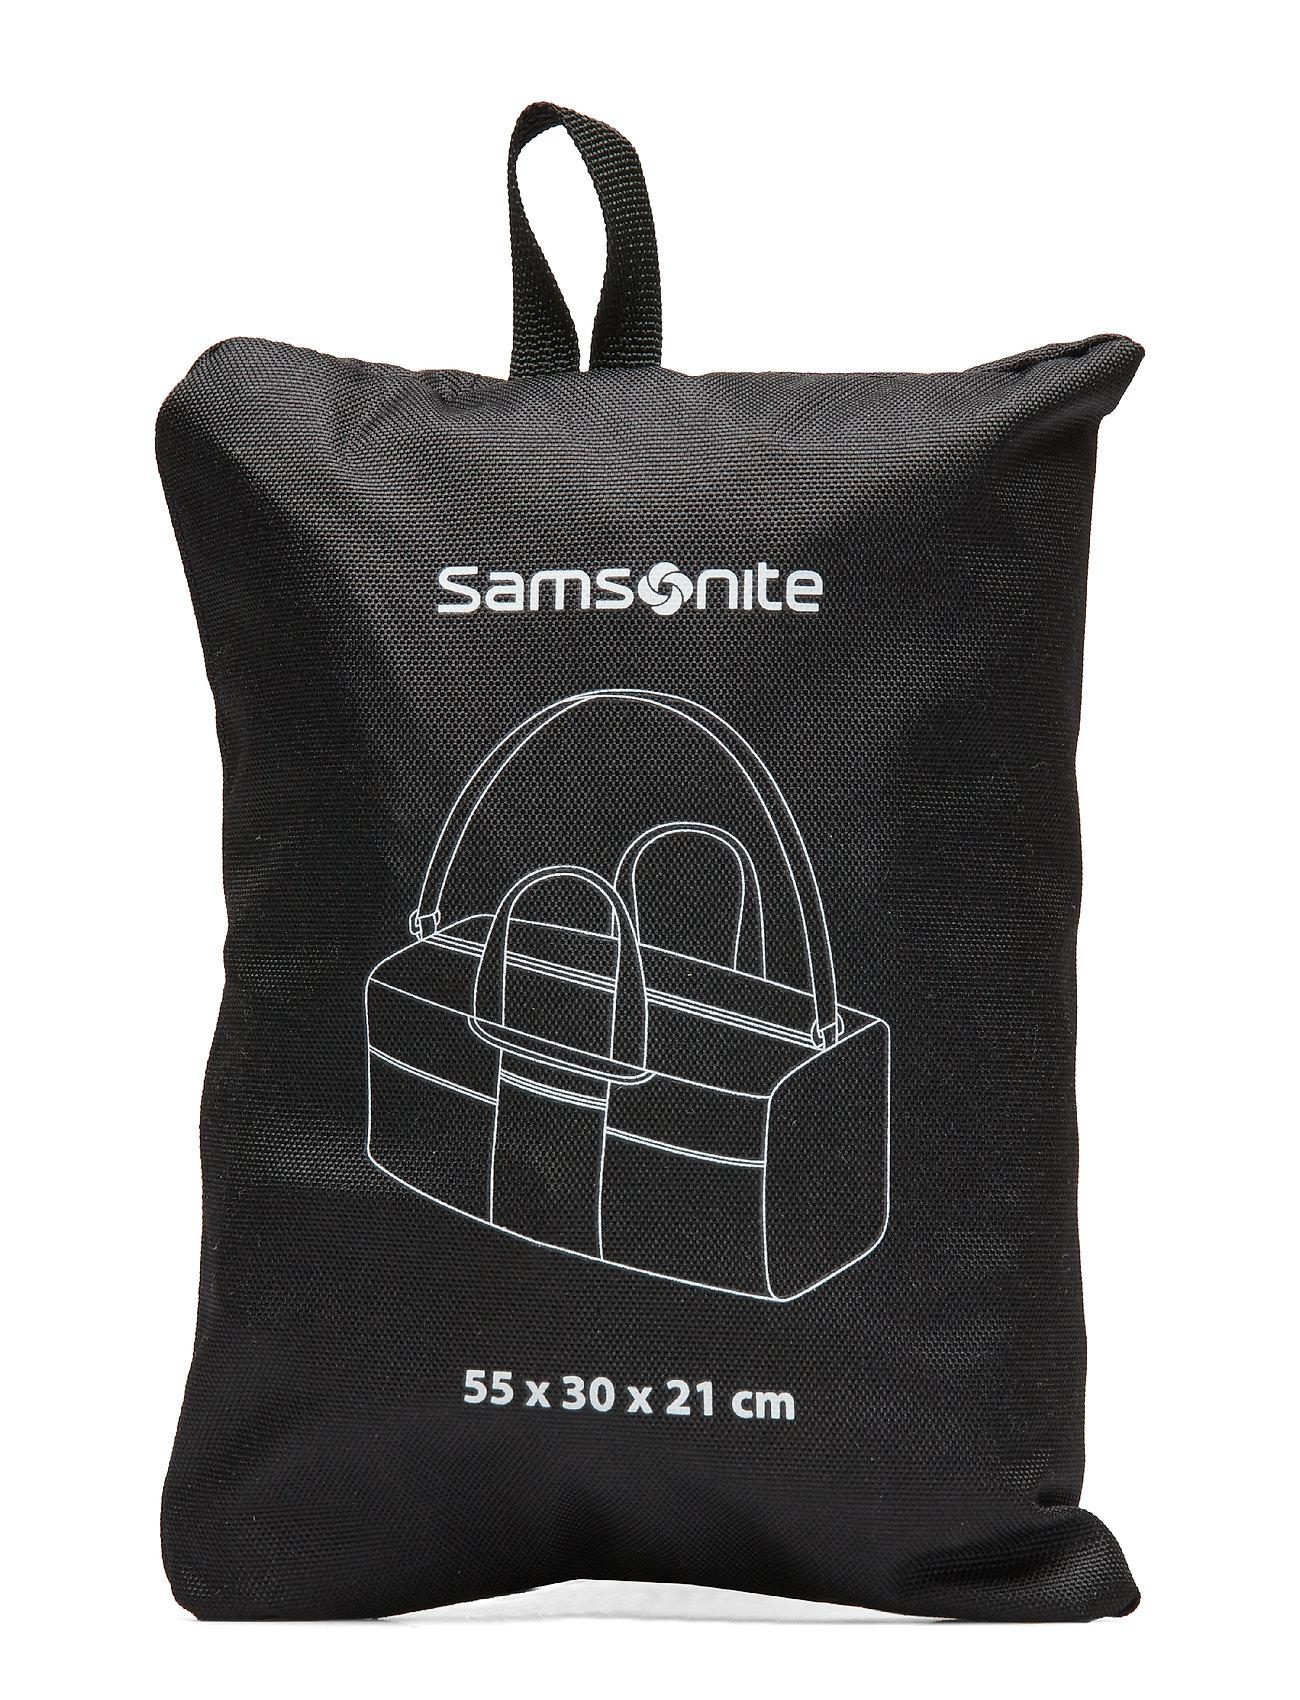 Samsonite - Packing Accessories - Foldable Duffle - black - 0